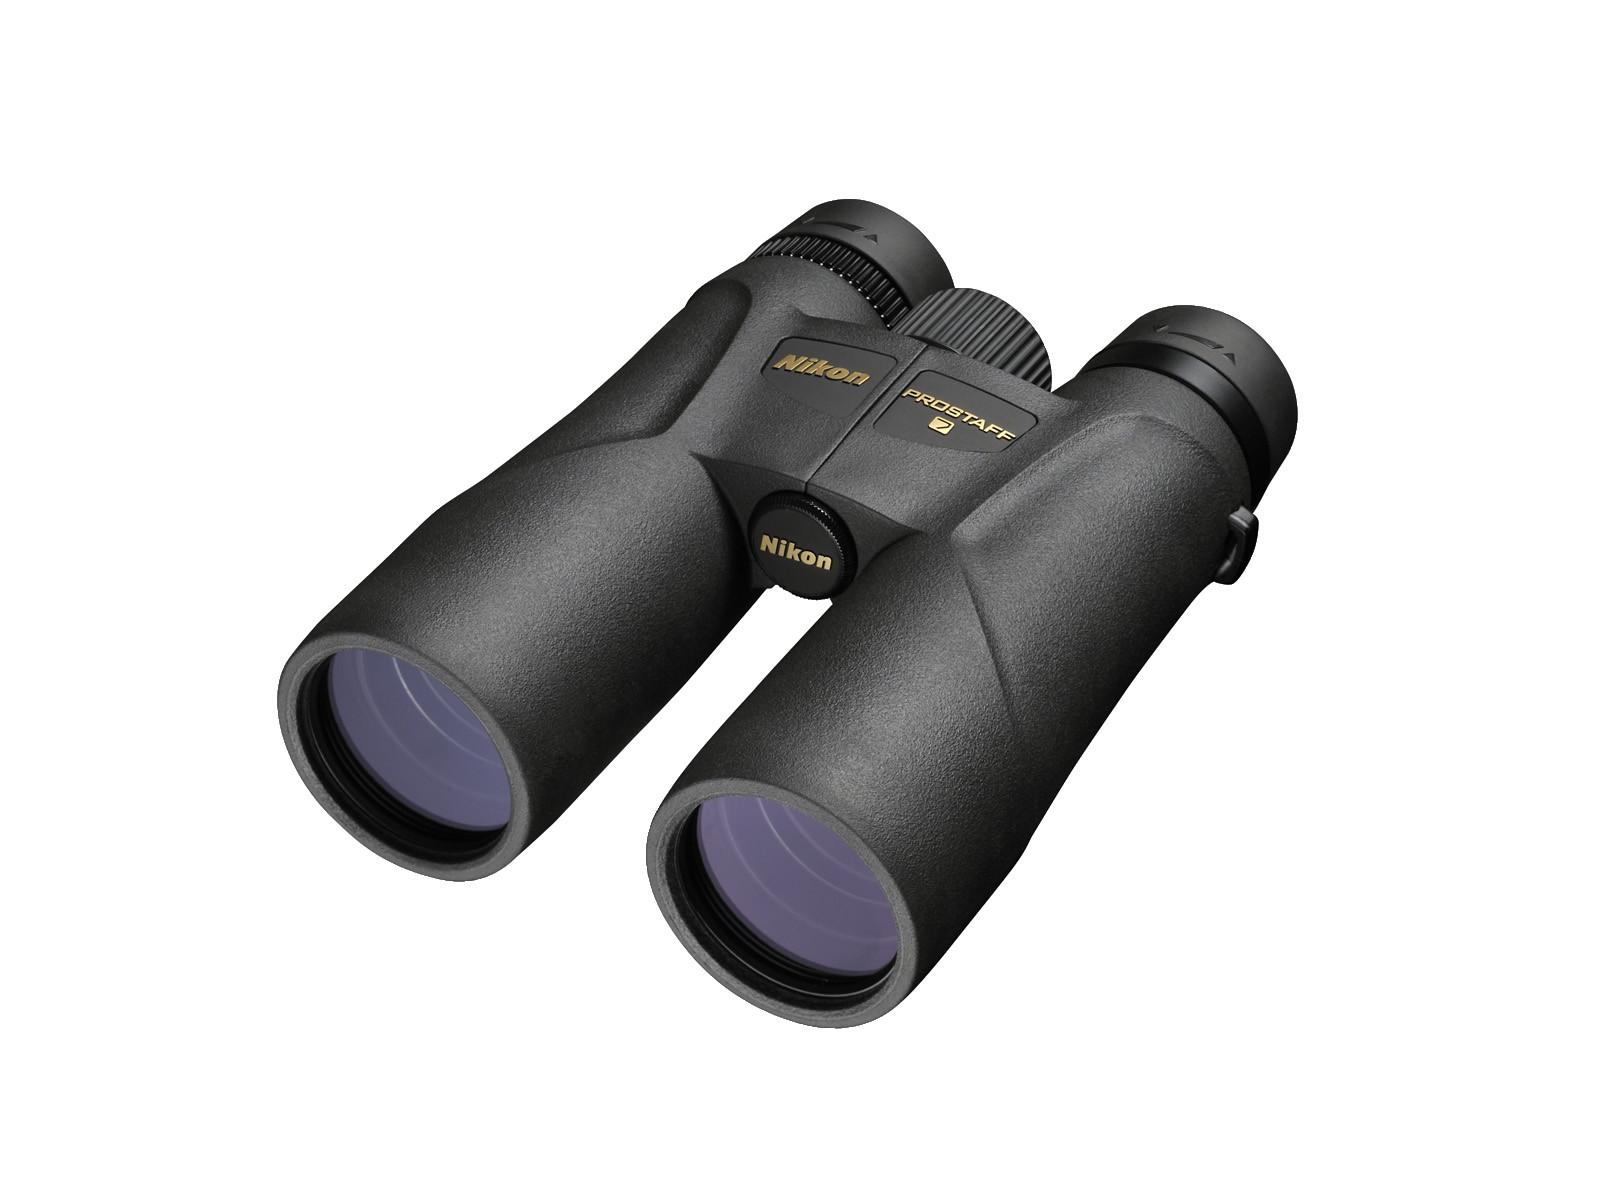 Prostaff 7s 8X42 雙筒望遠鏡